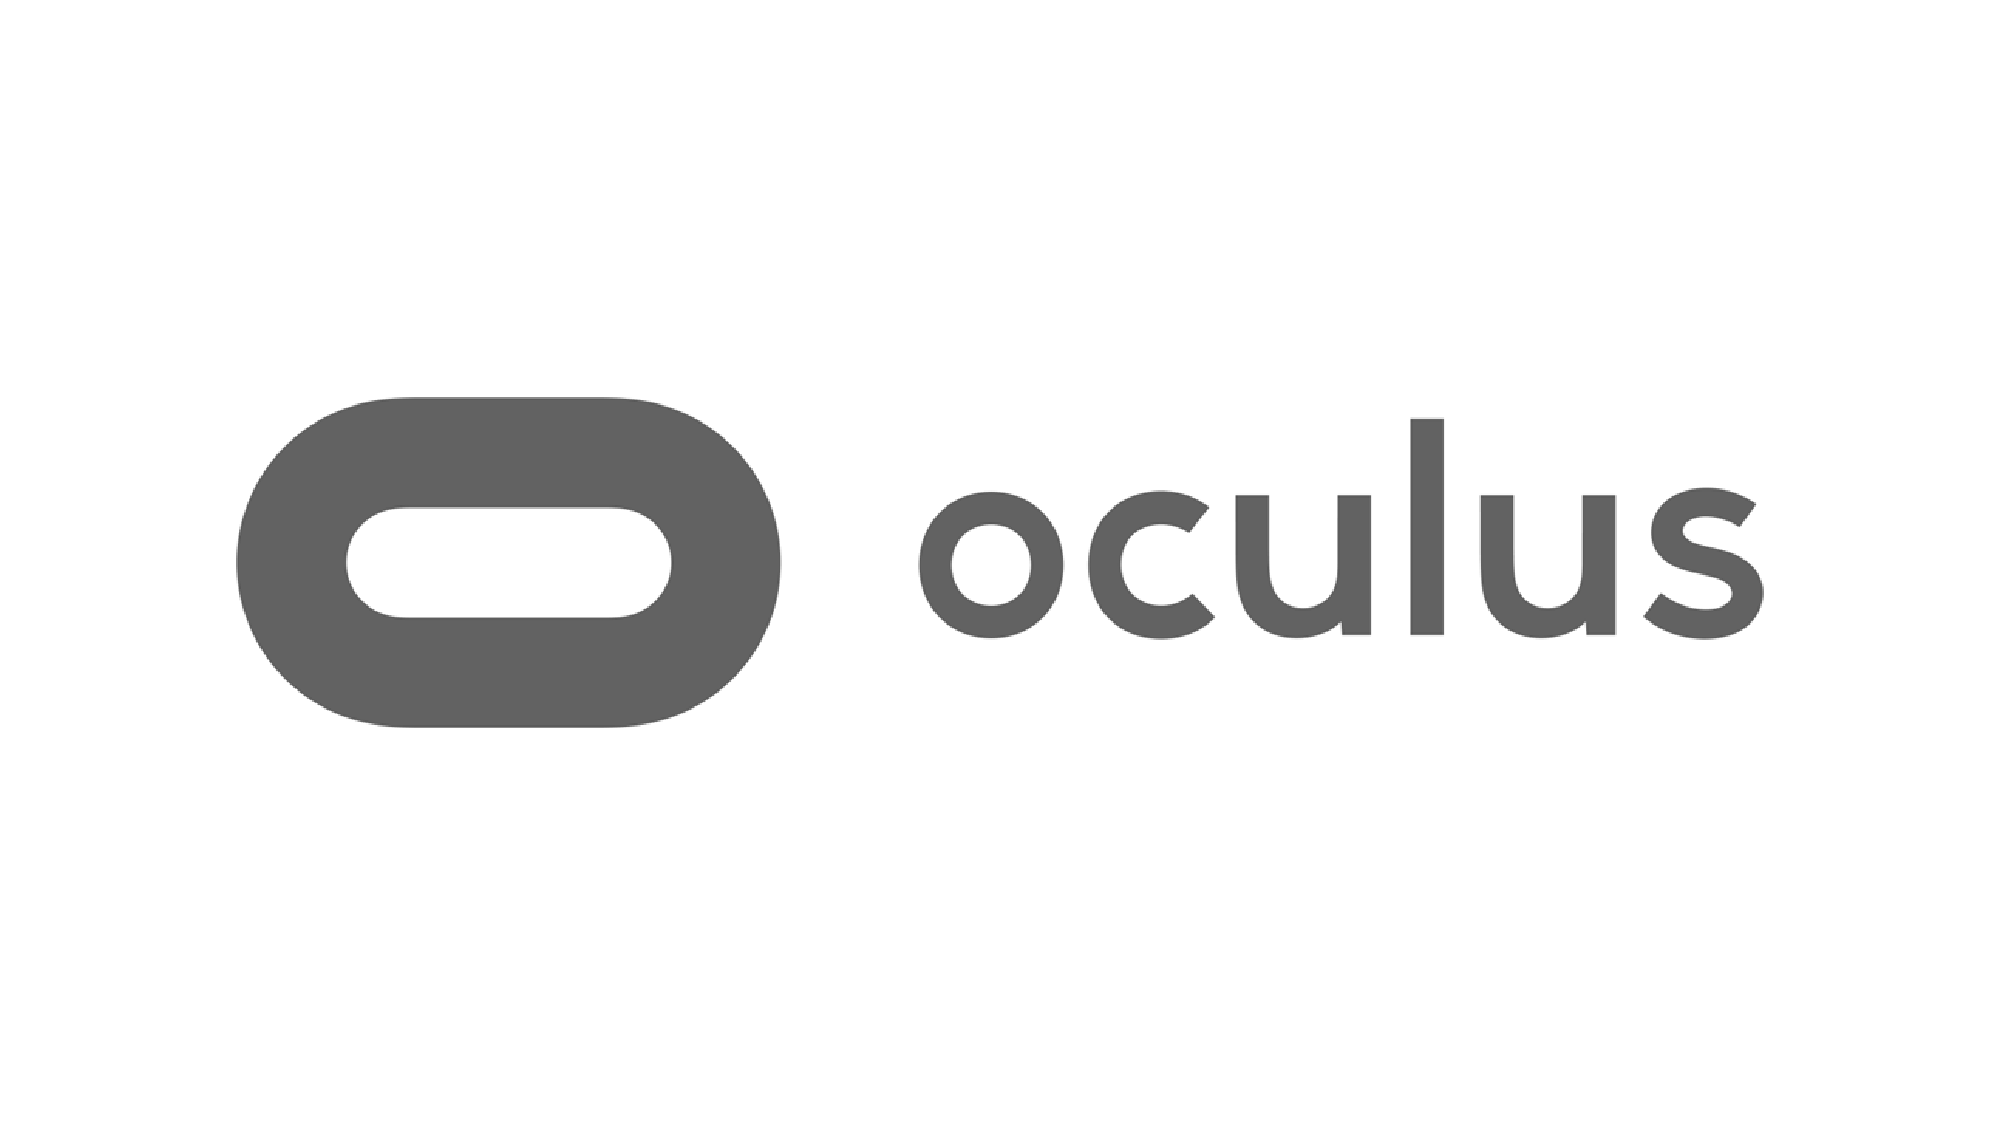 6.oculus.png